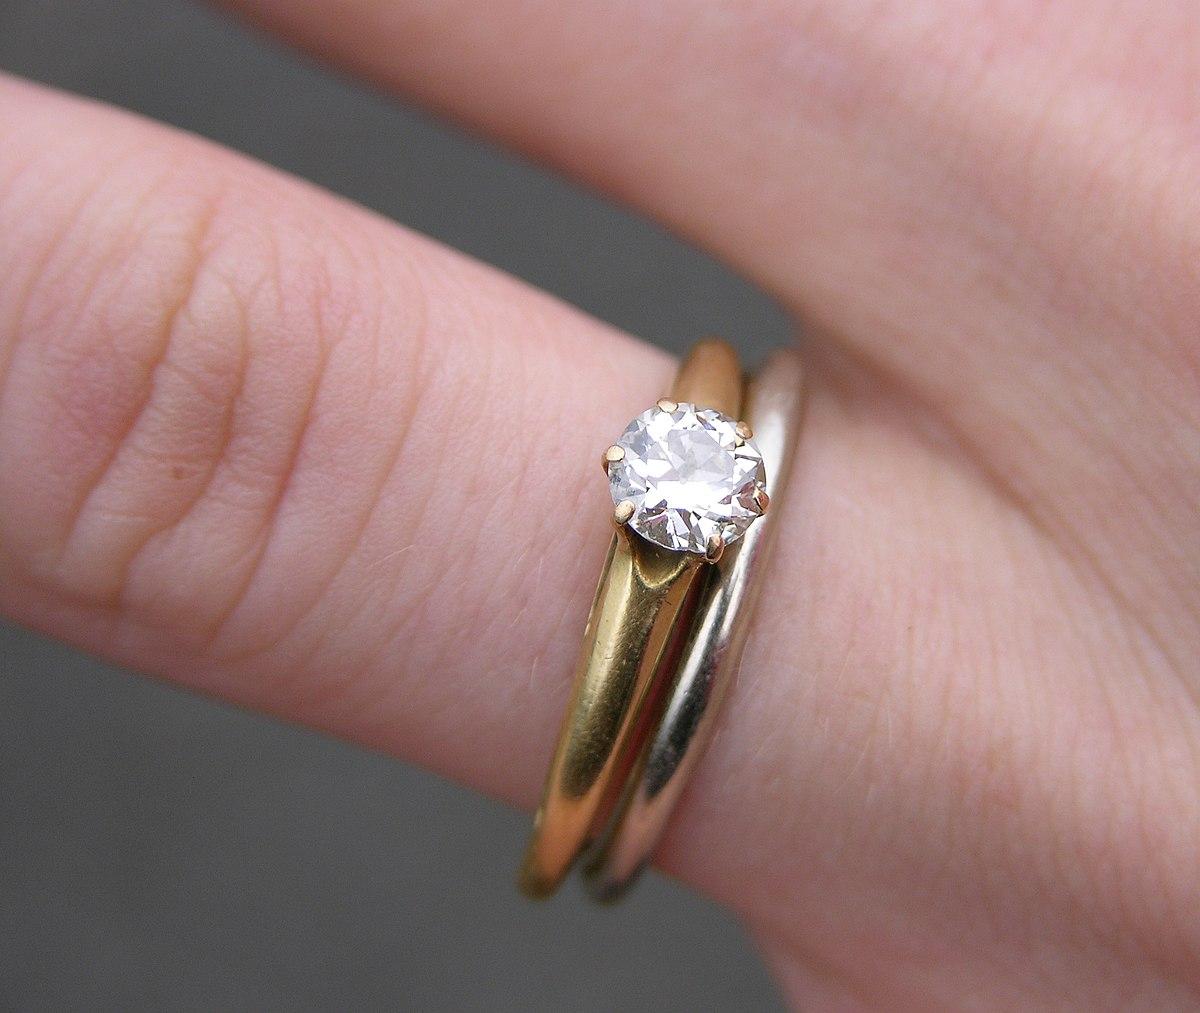 Engagement ring engagement wedding rings